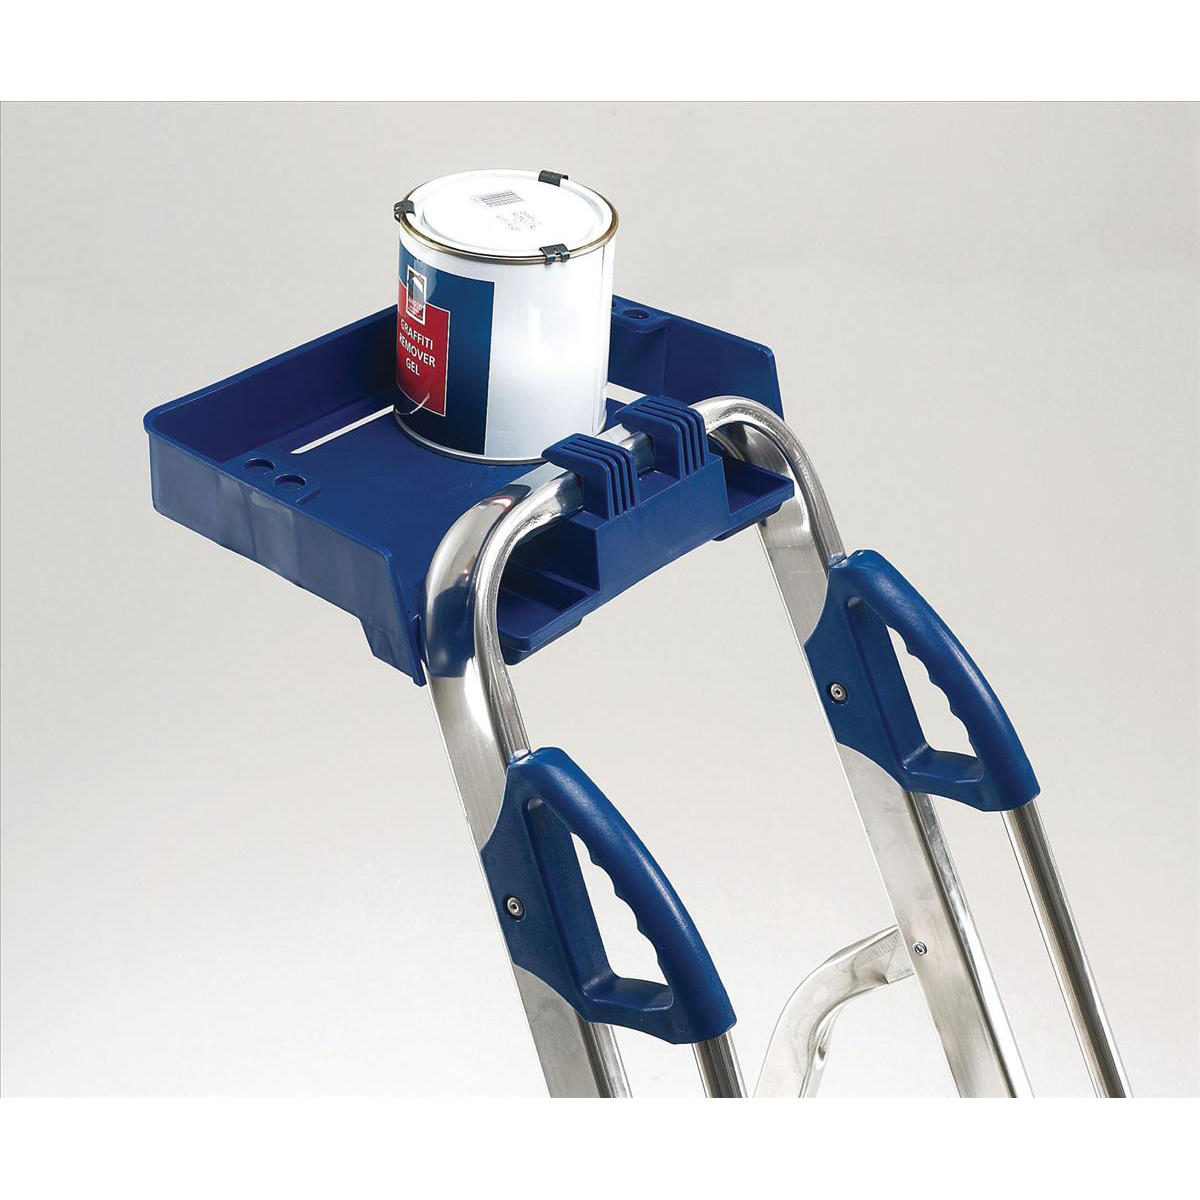 Tradesman Platform Step Ladder 7 Steps Capacity 150kg Silver/Blue